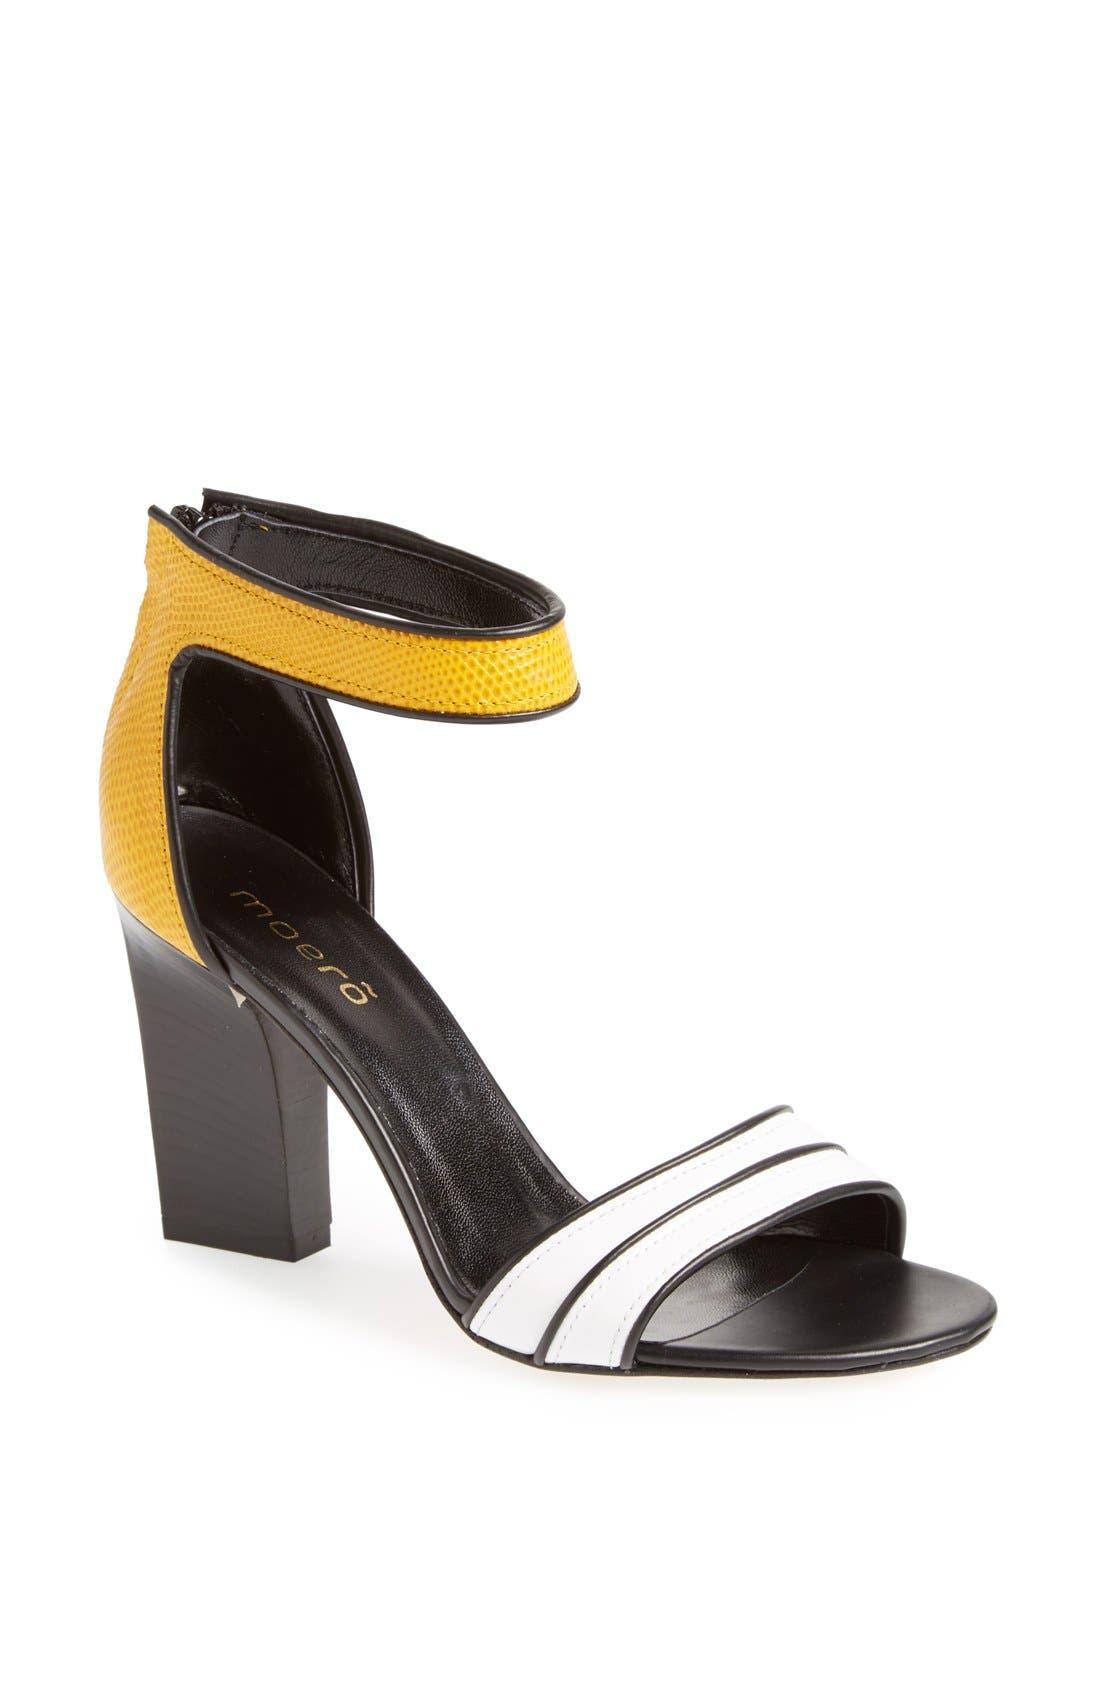 Alternate Image 1 Selected - Moero Snake Embossed Leather Sandal